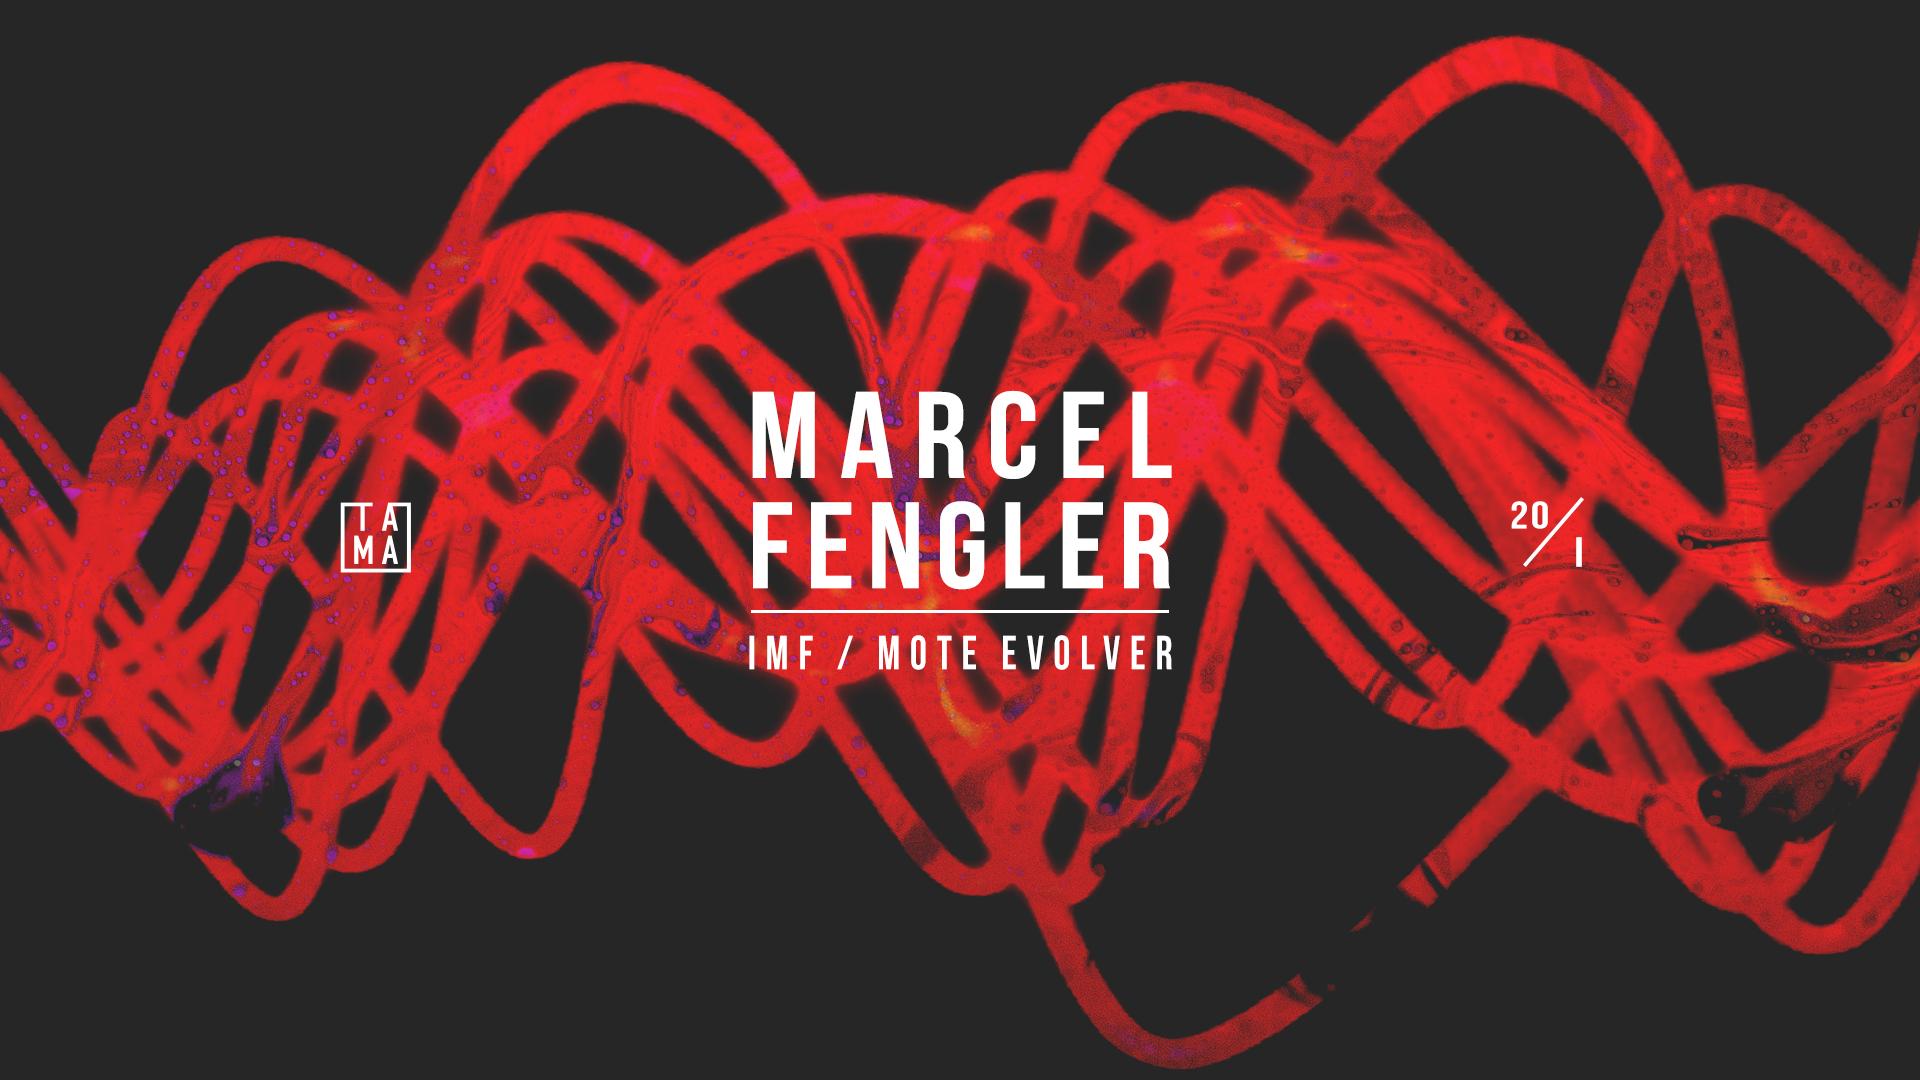 Marcel Fengler / Audiorotax / Okami